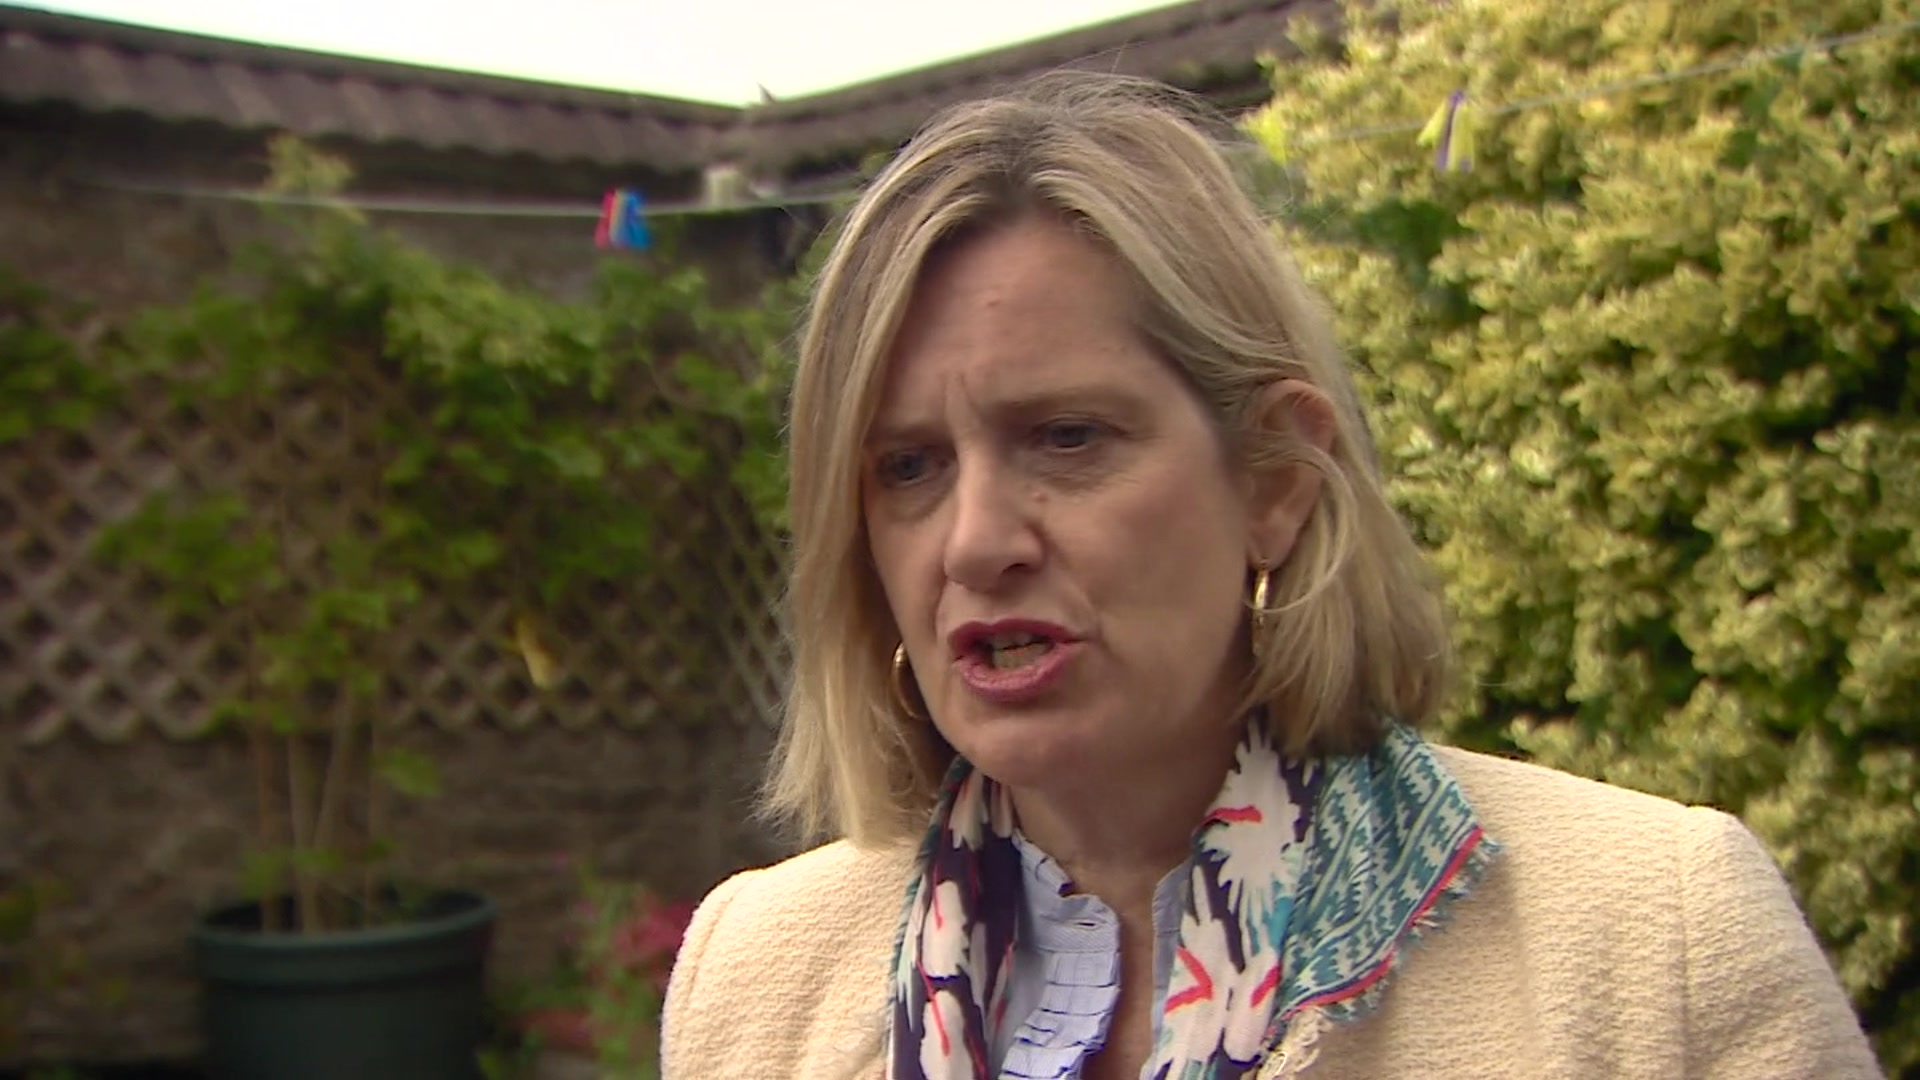 Rudd defends Universal Credit during SW visit